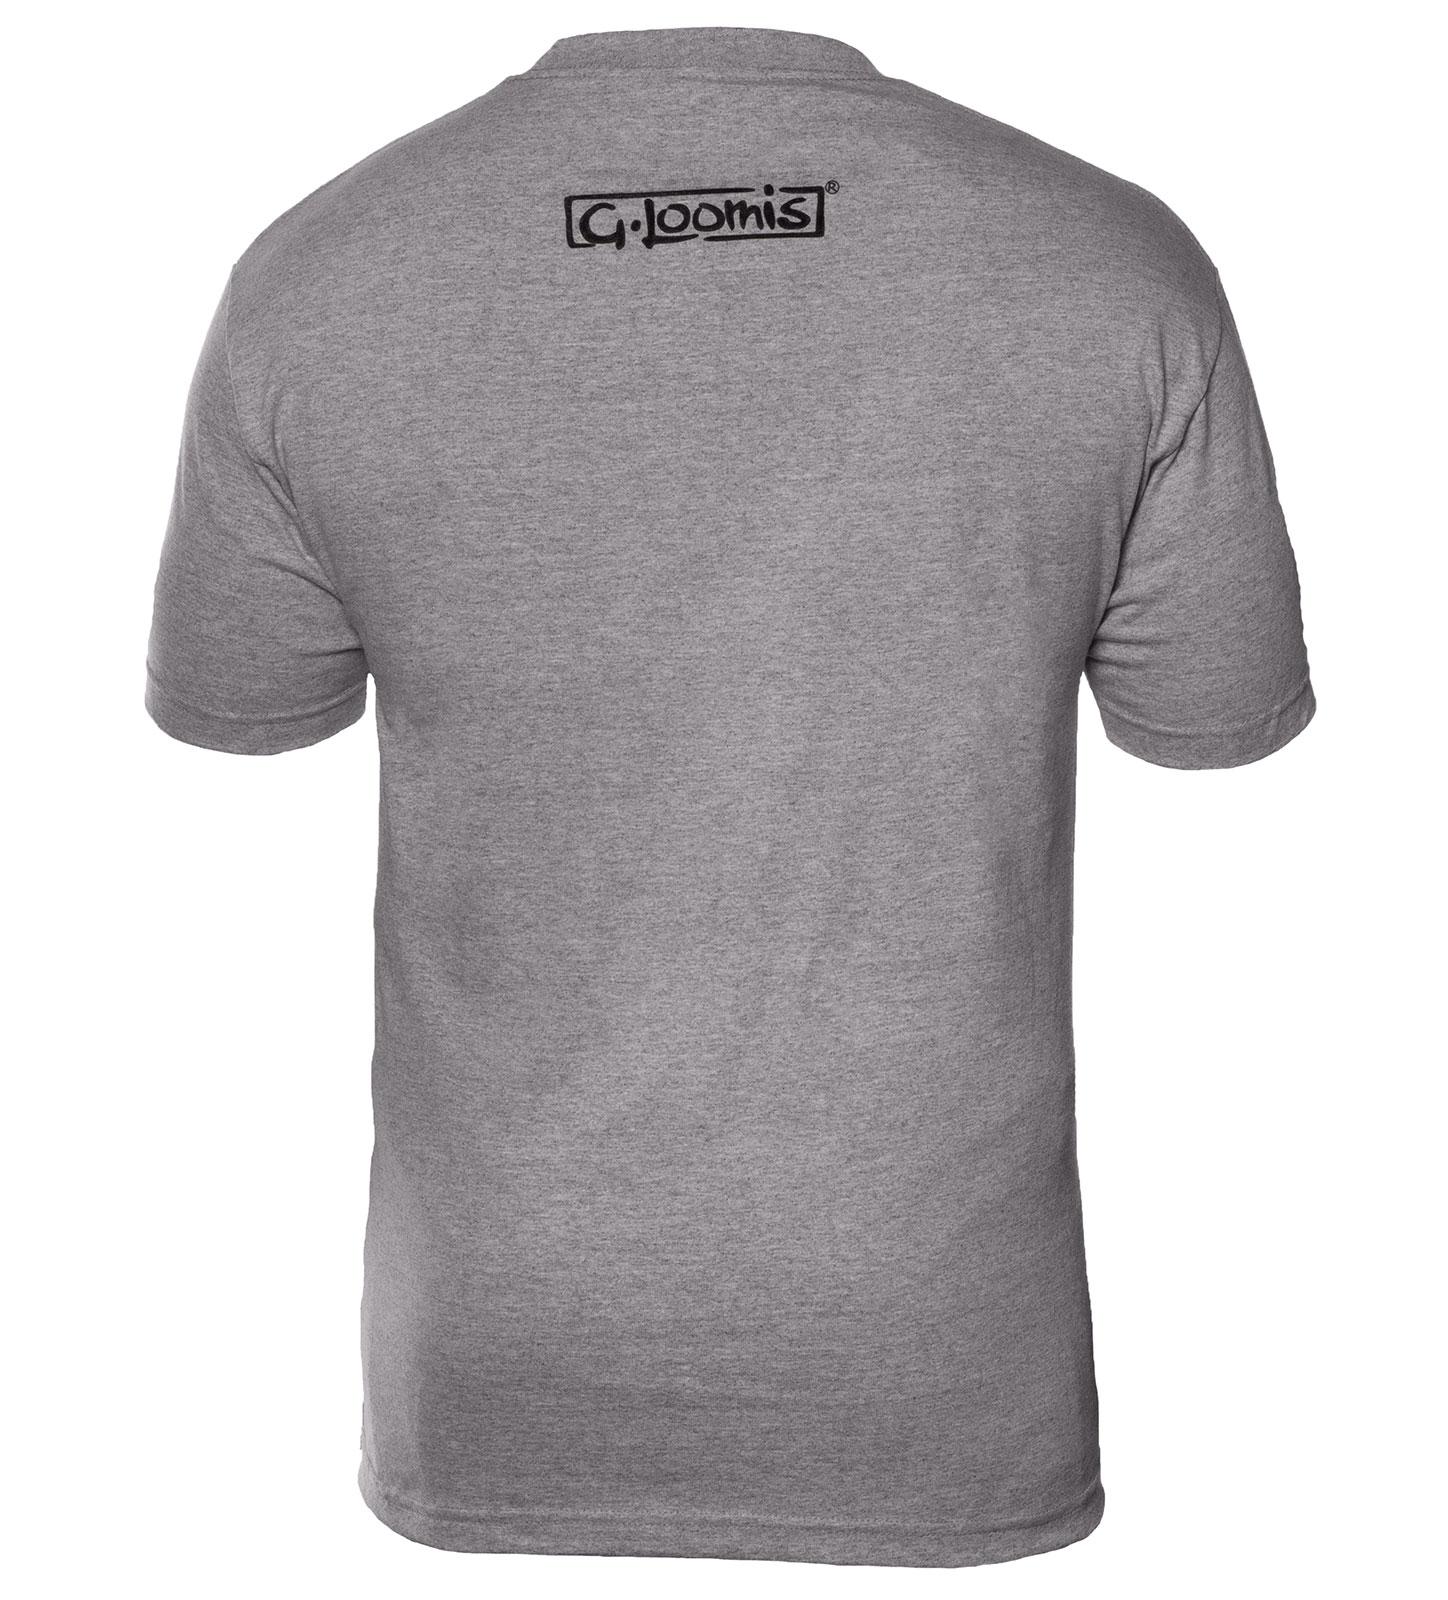 G-Loomis-Skeleton-Fish-Corpo-Short-Sleeve-Fishing-T-Shirt-Select-Size-amp-Color thumbnail 8